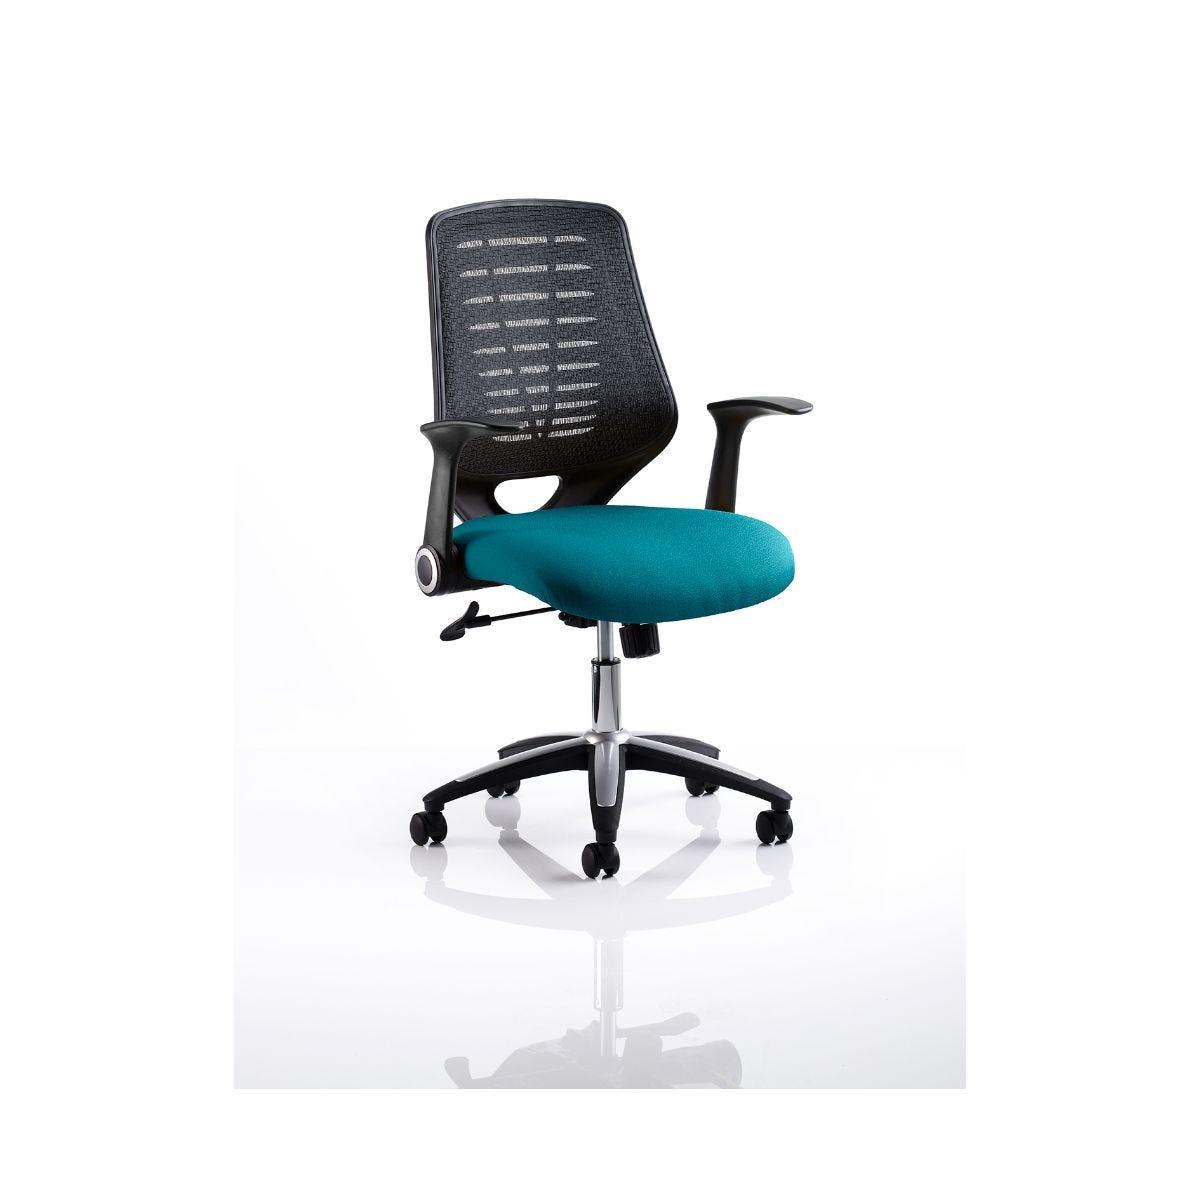 Relay Mesh Back Office Chair, Maringa